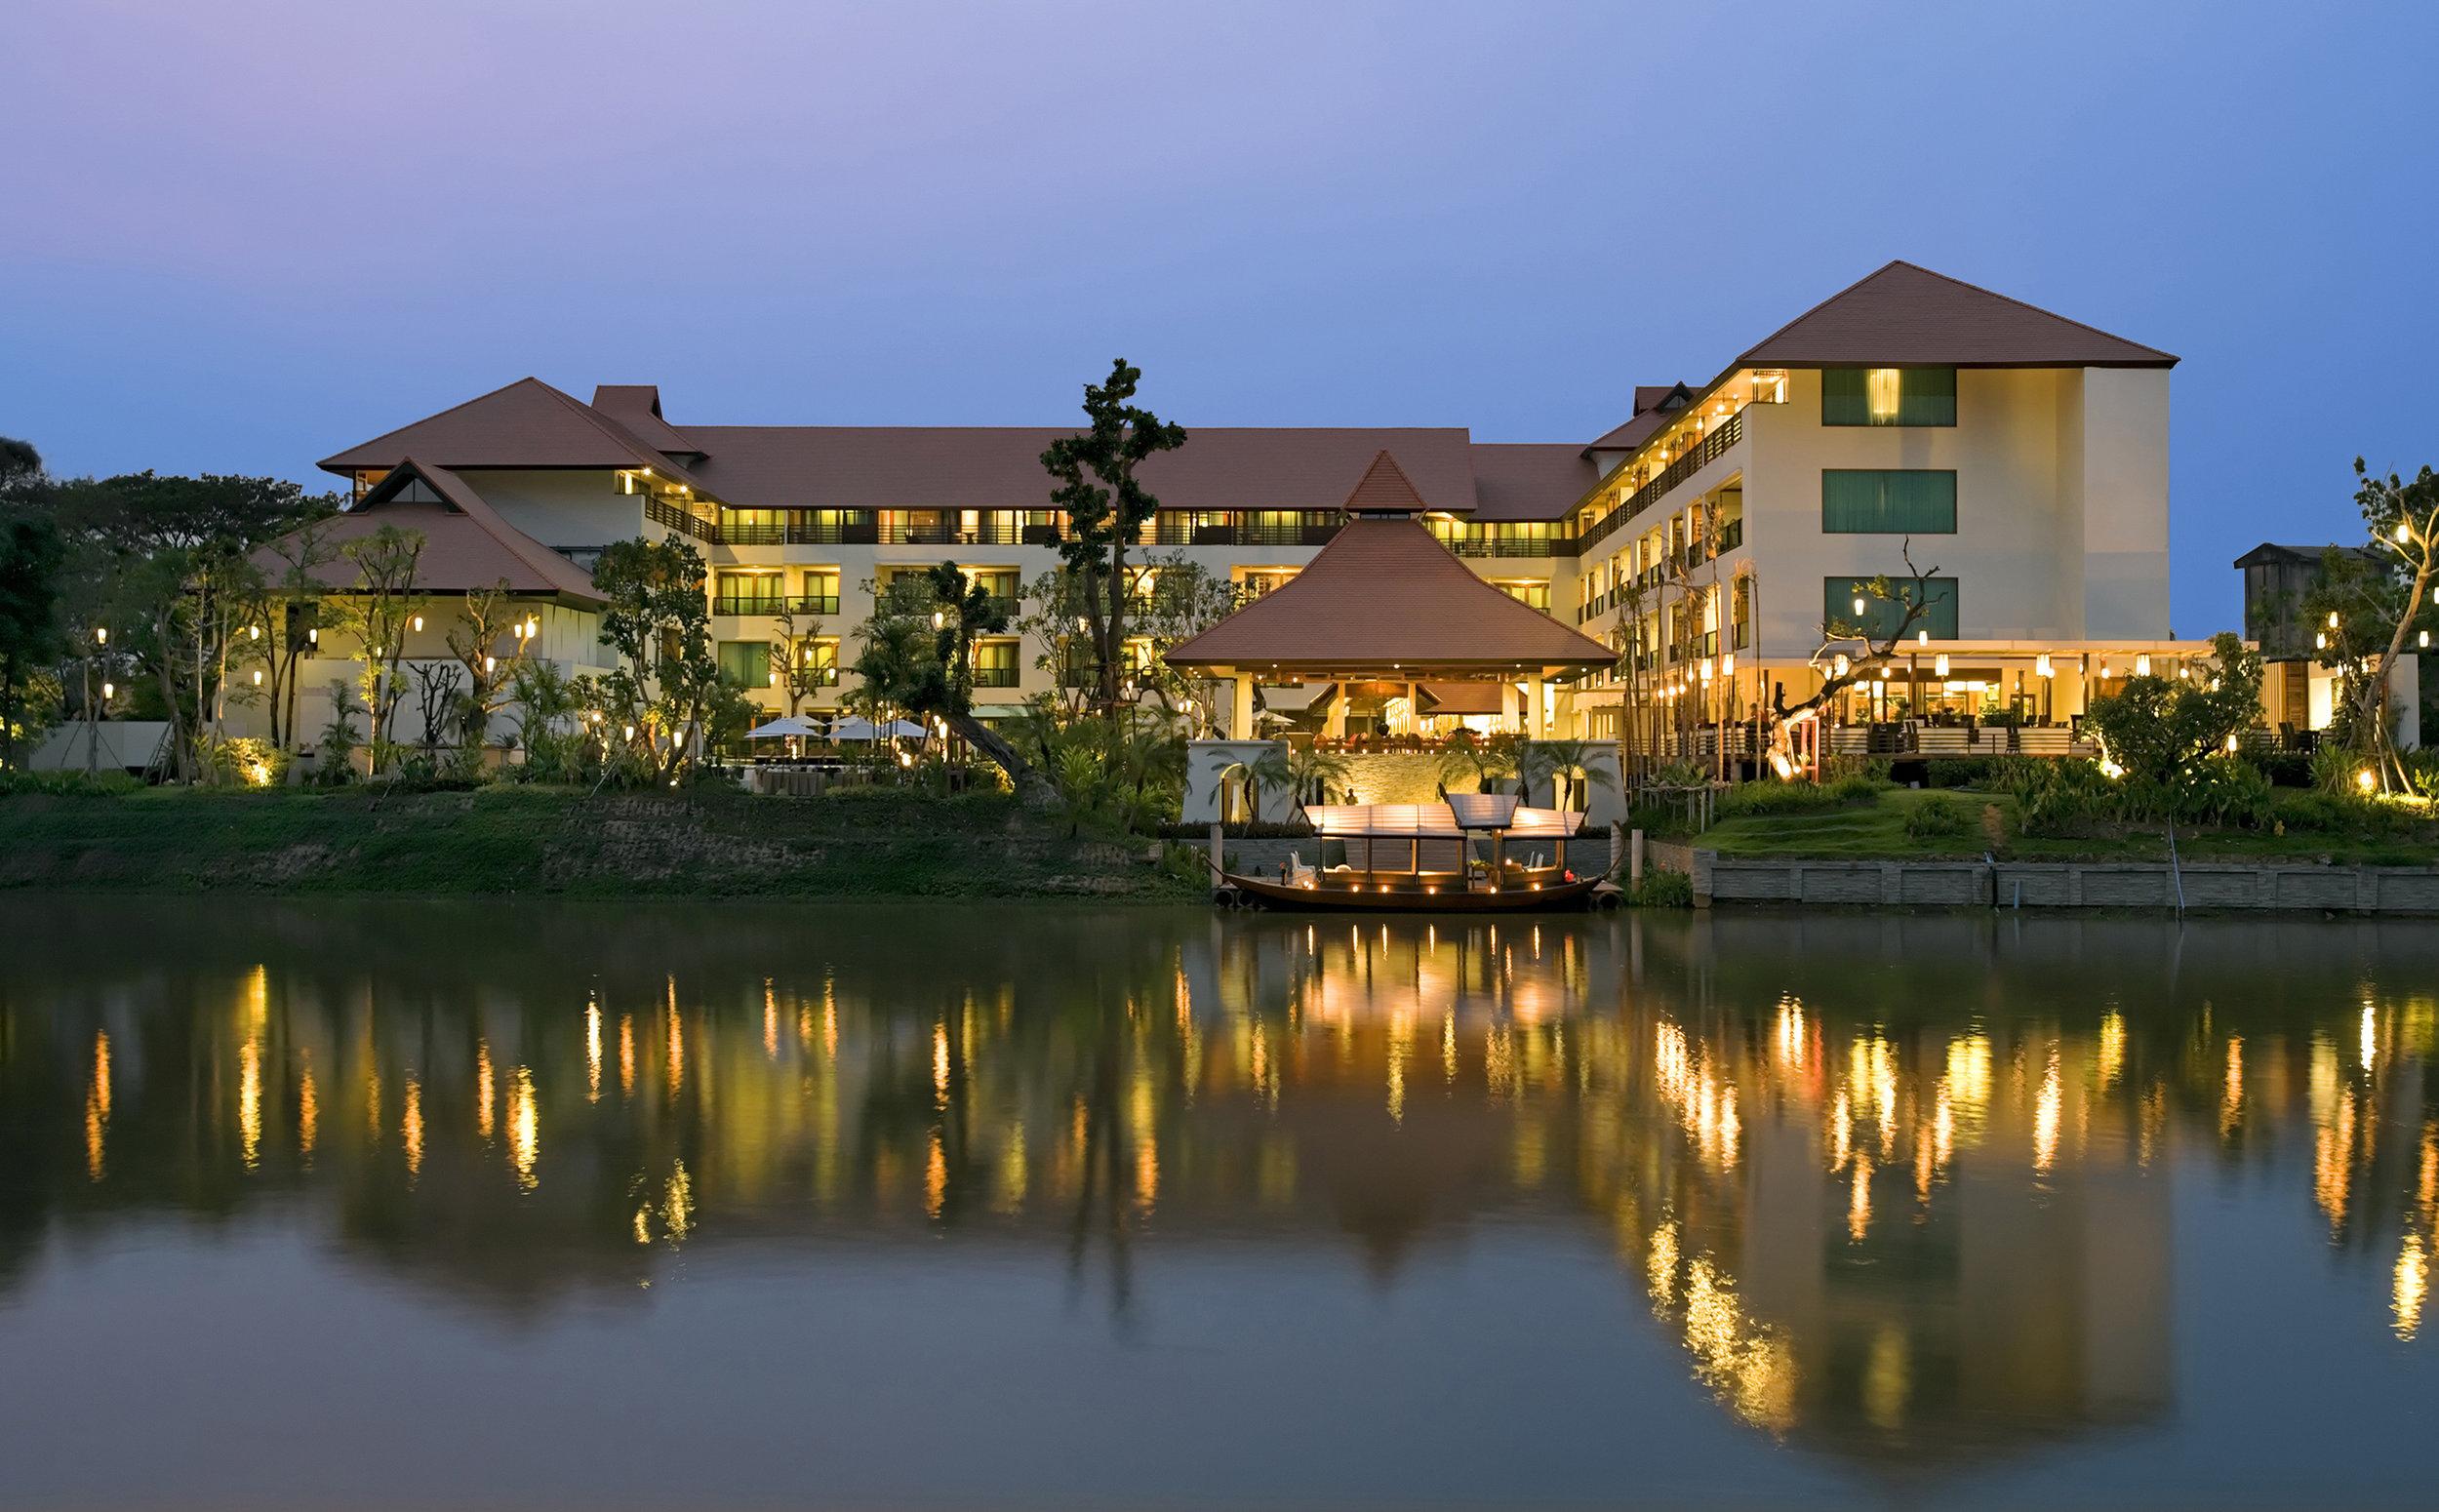 Rati Lanna Riverside Spa Resort - Chiang Mai, Thailand